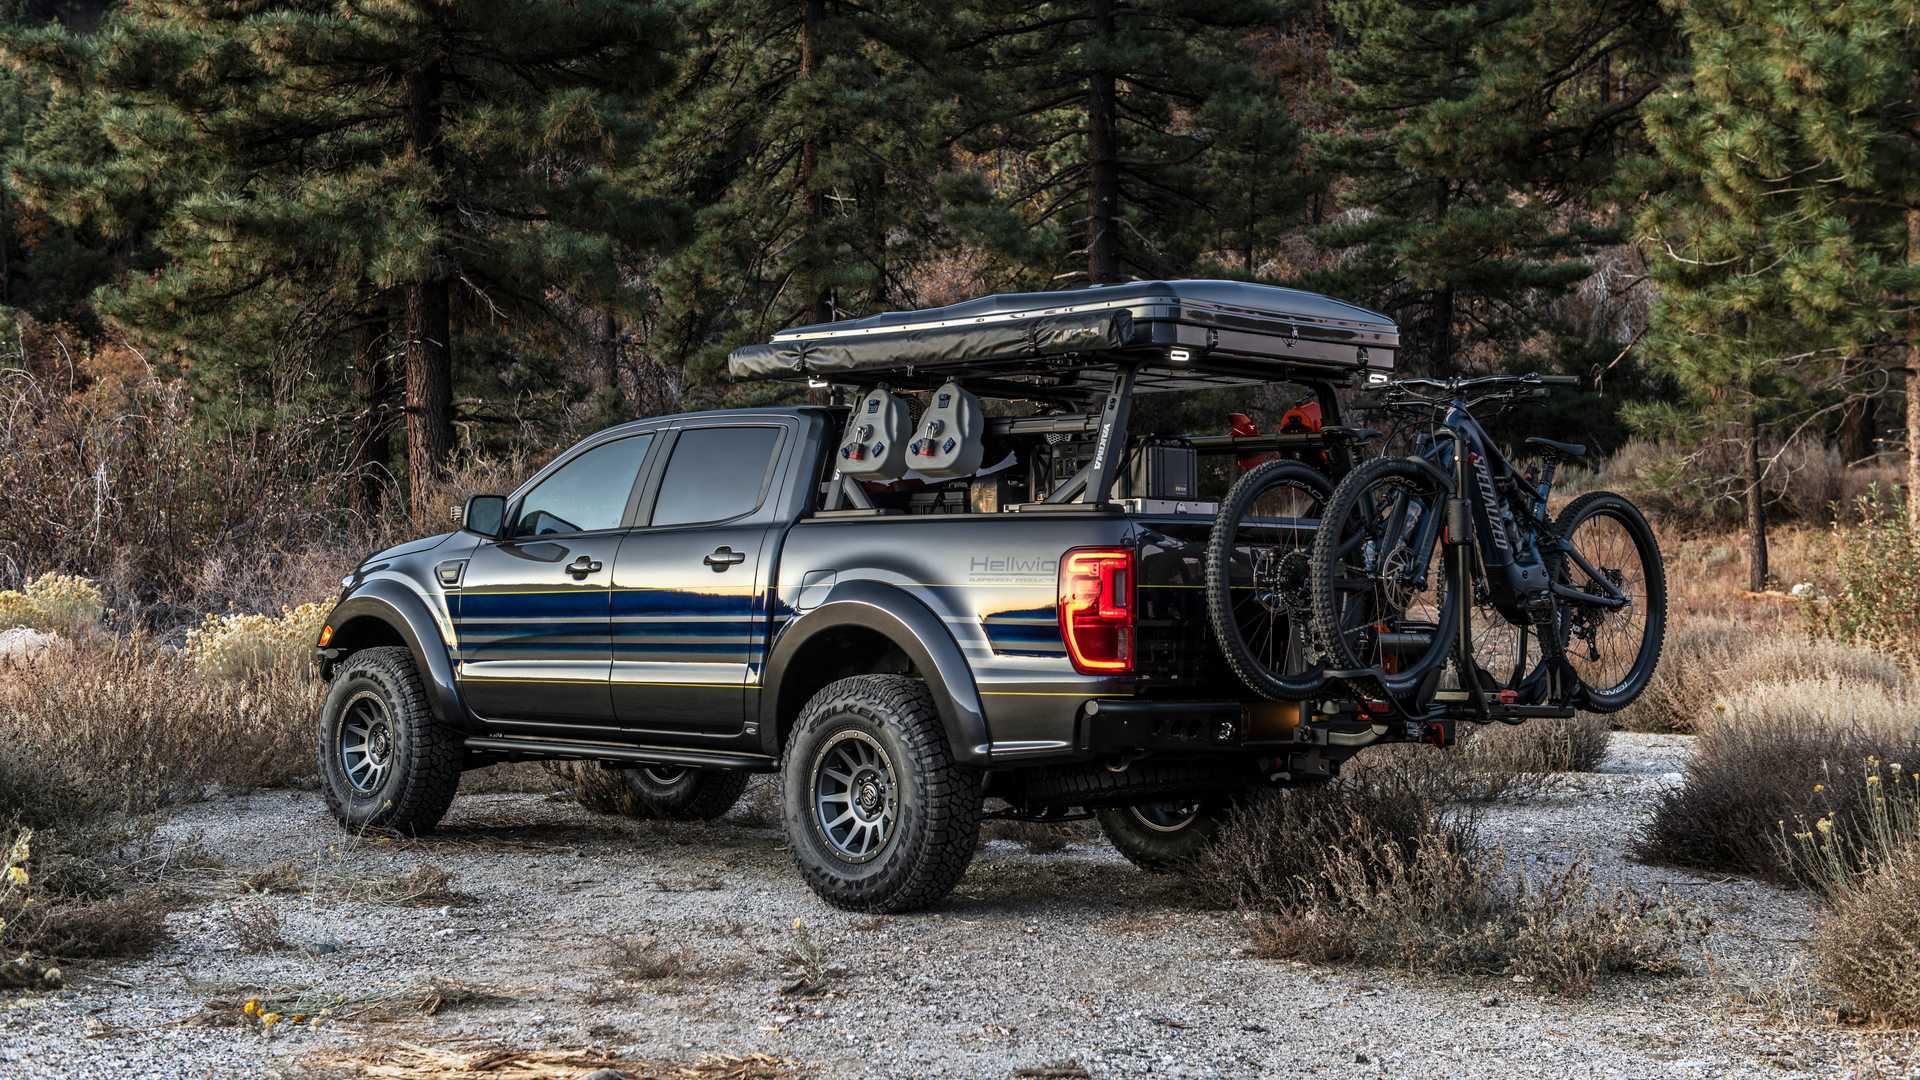 hellwig-attainable-adventure-ford-ranger-2